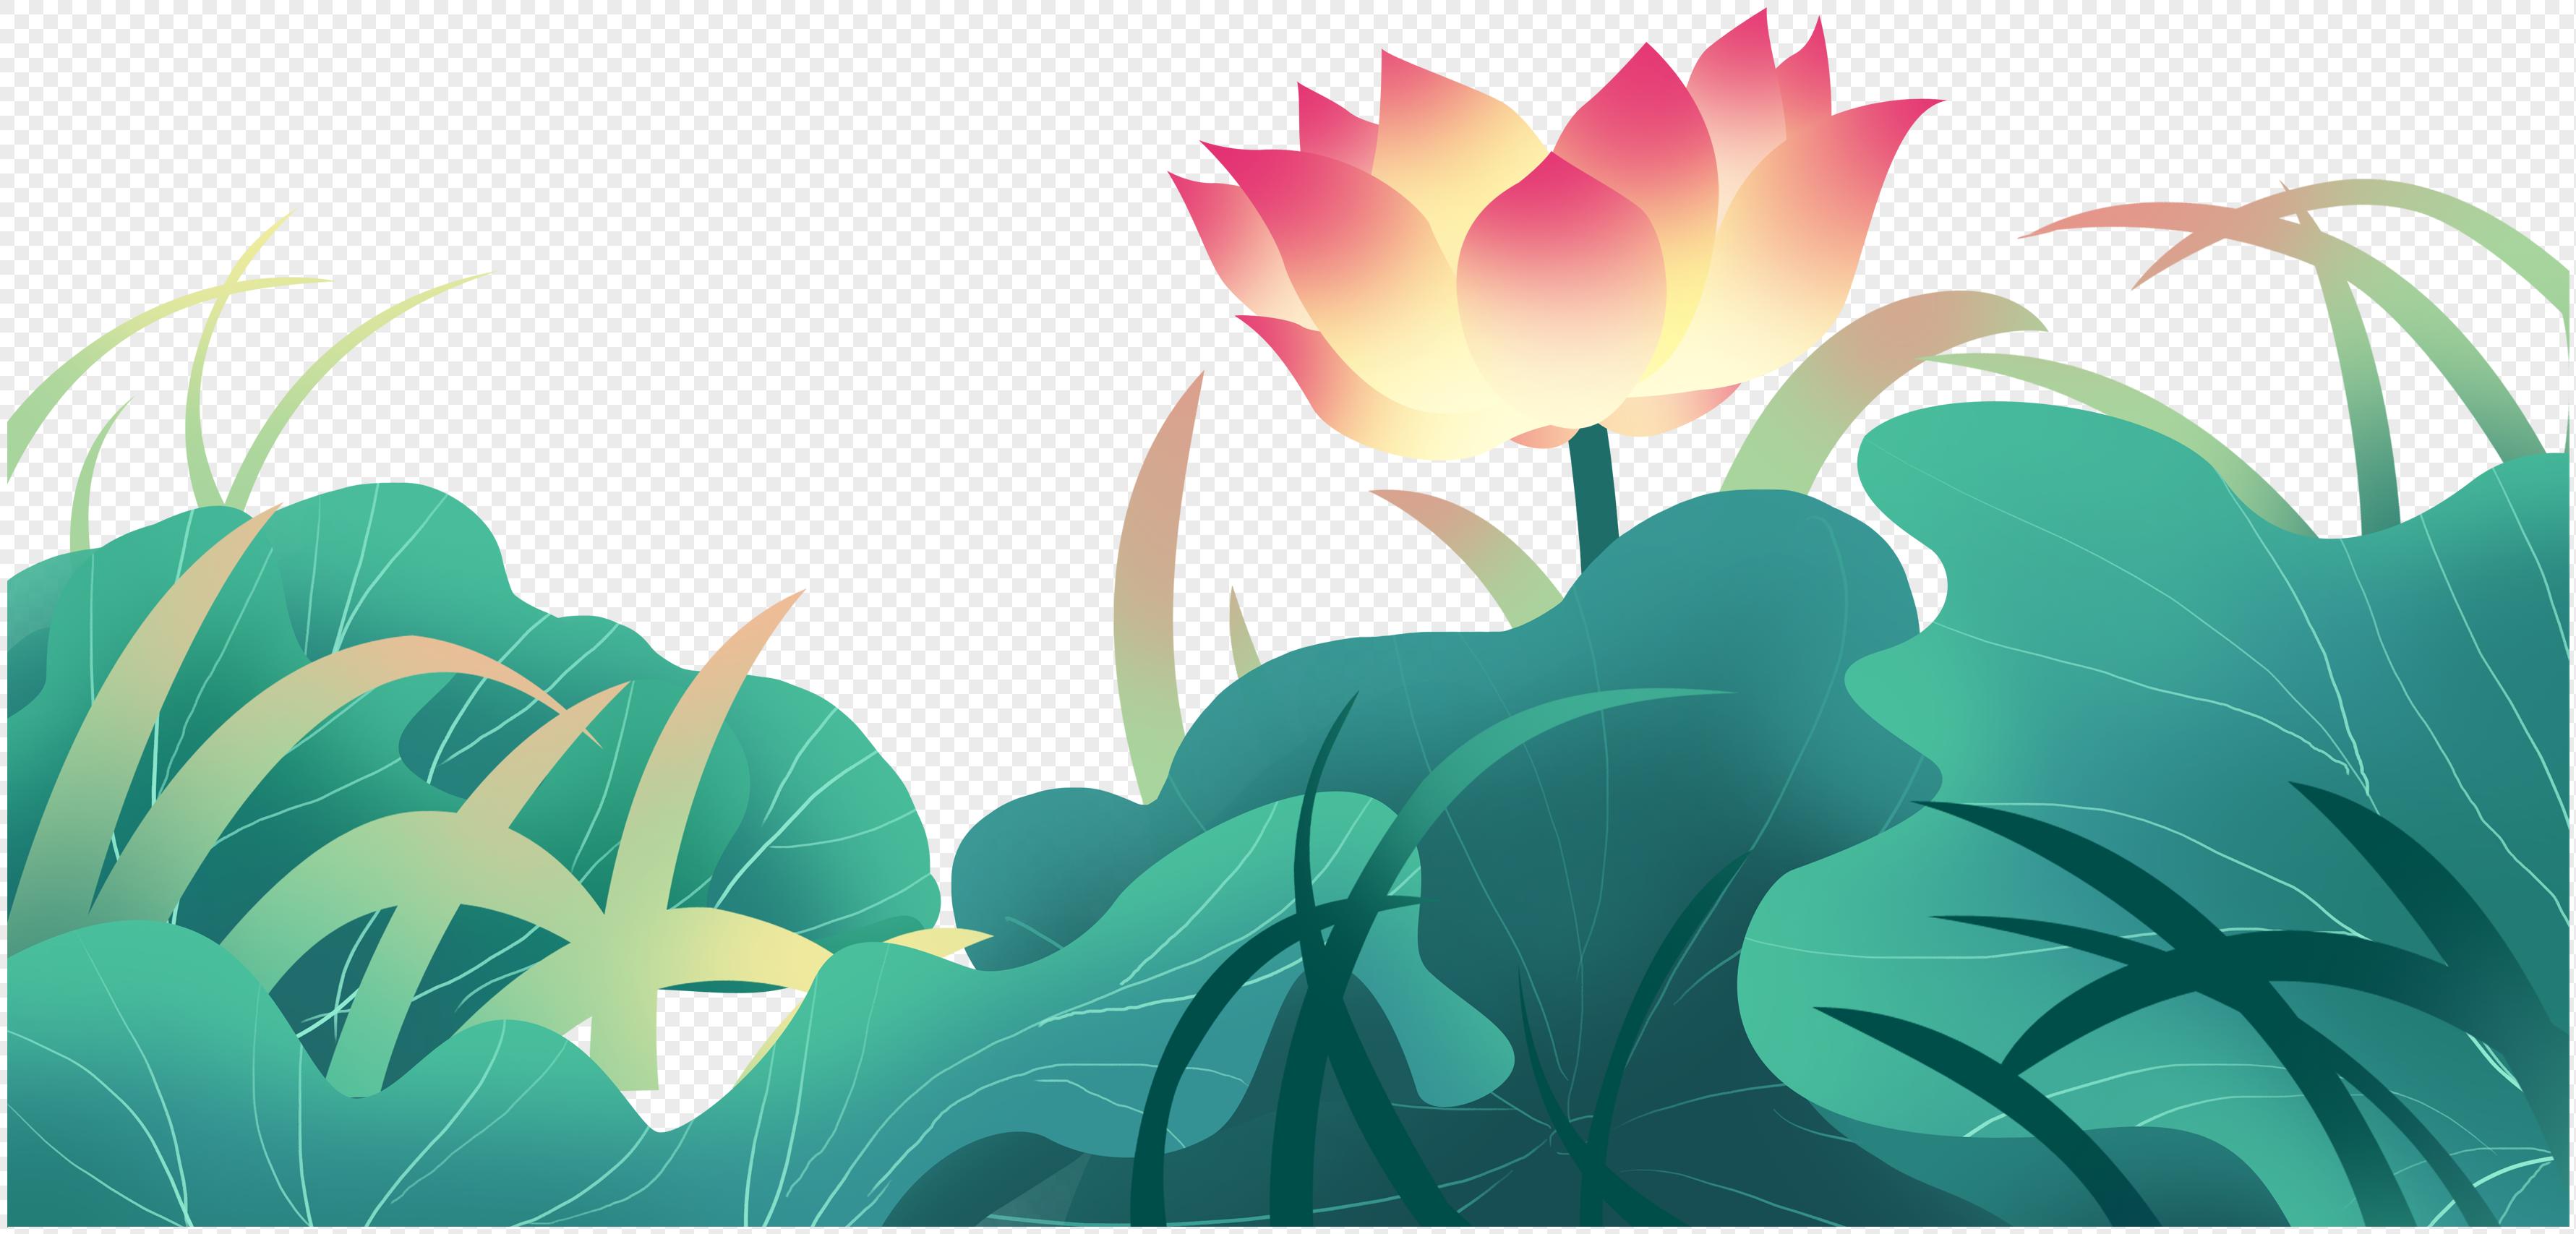 Lotus Flower Png Imagepicture Free Download 400267357lovepik